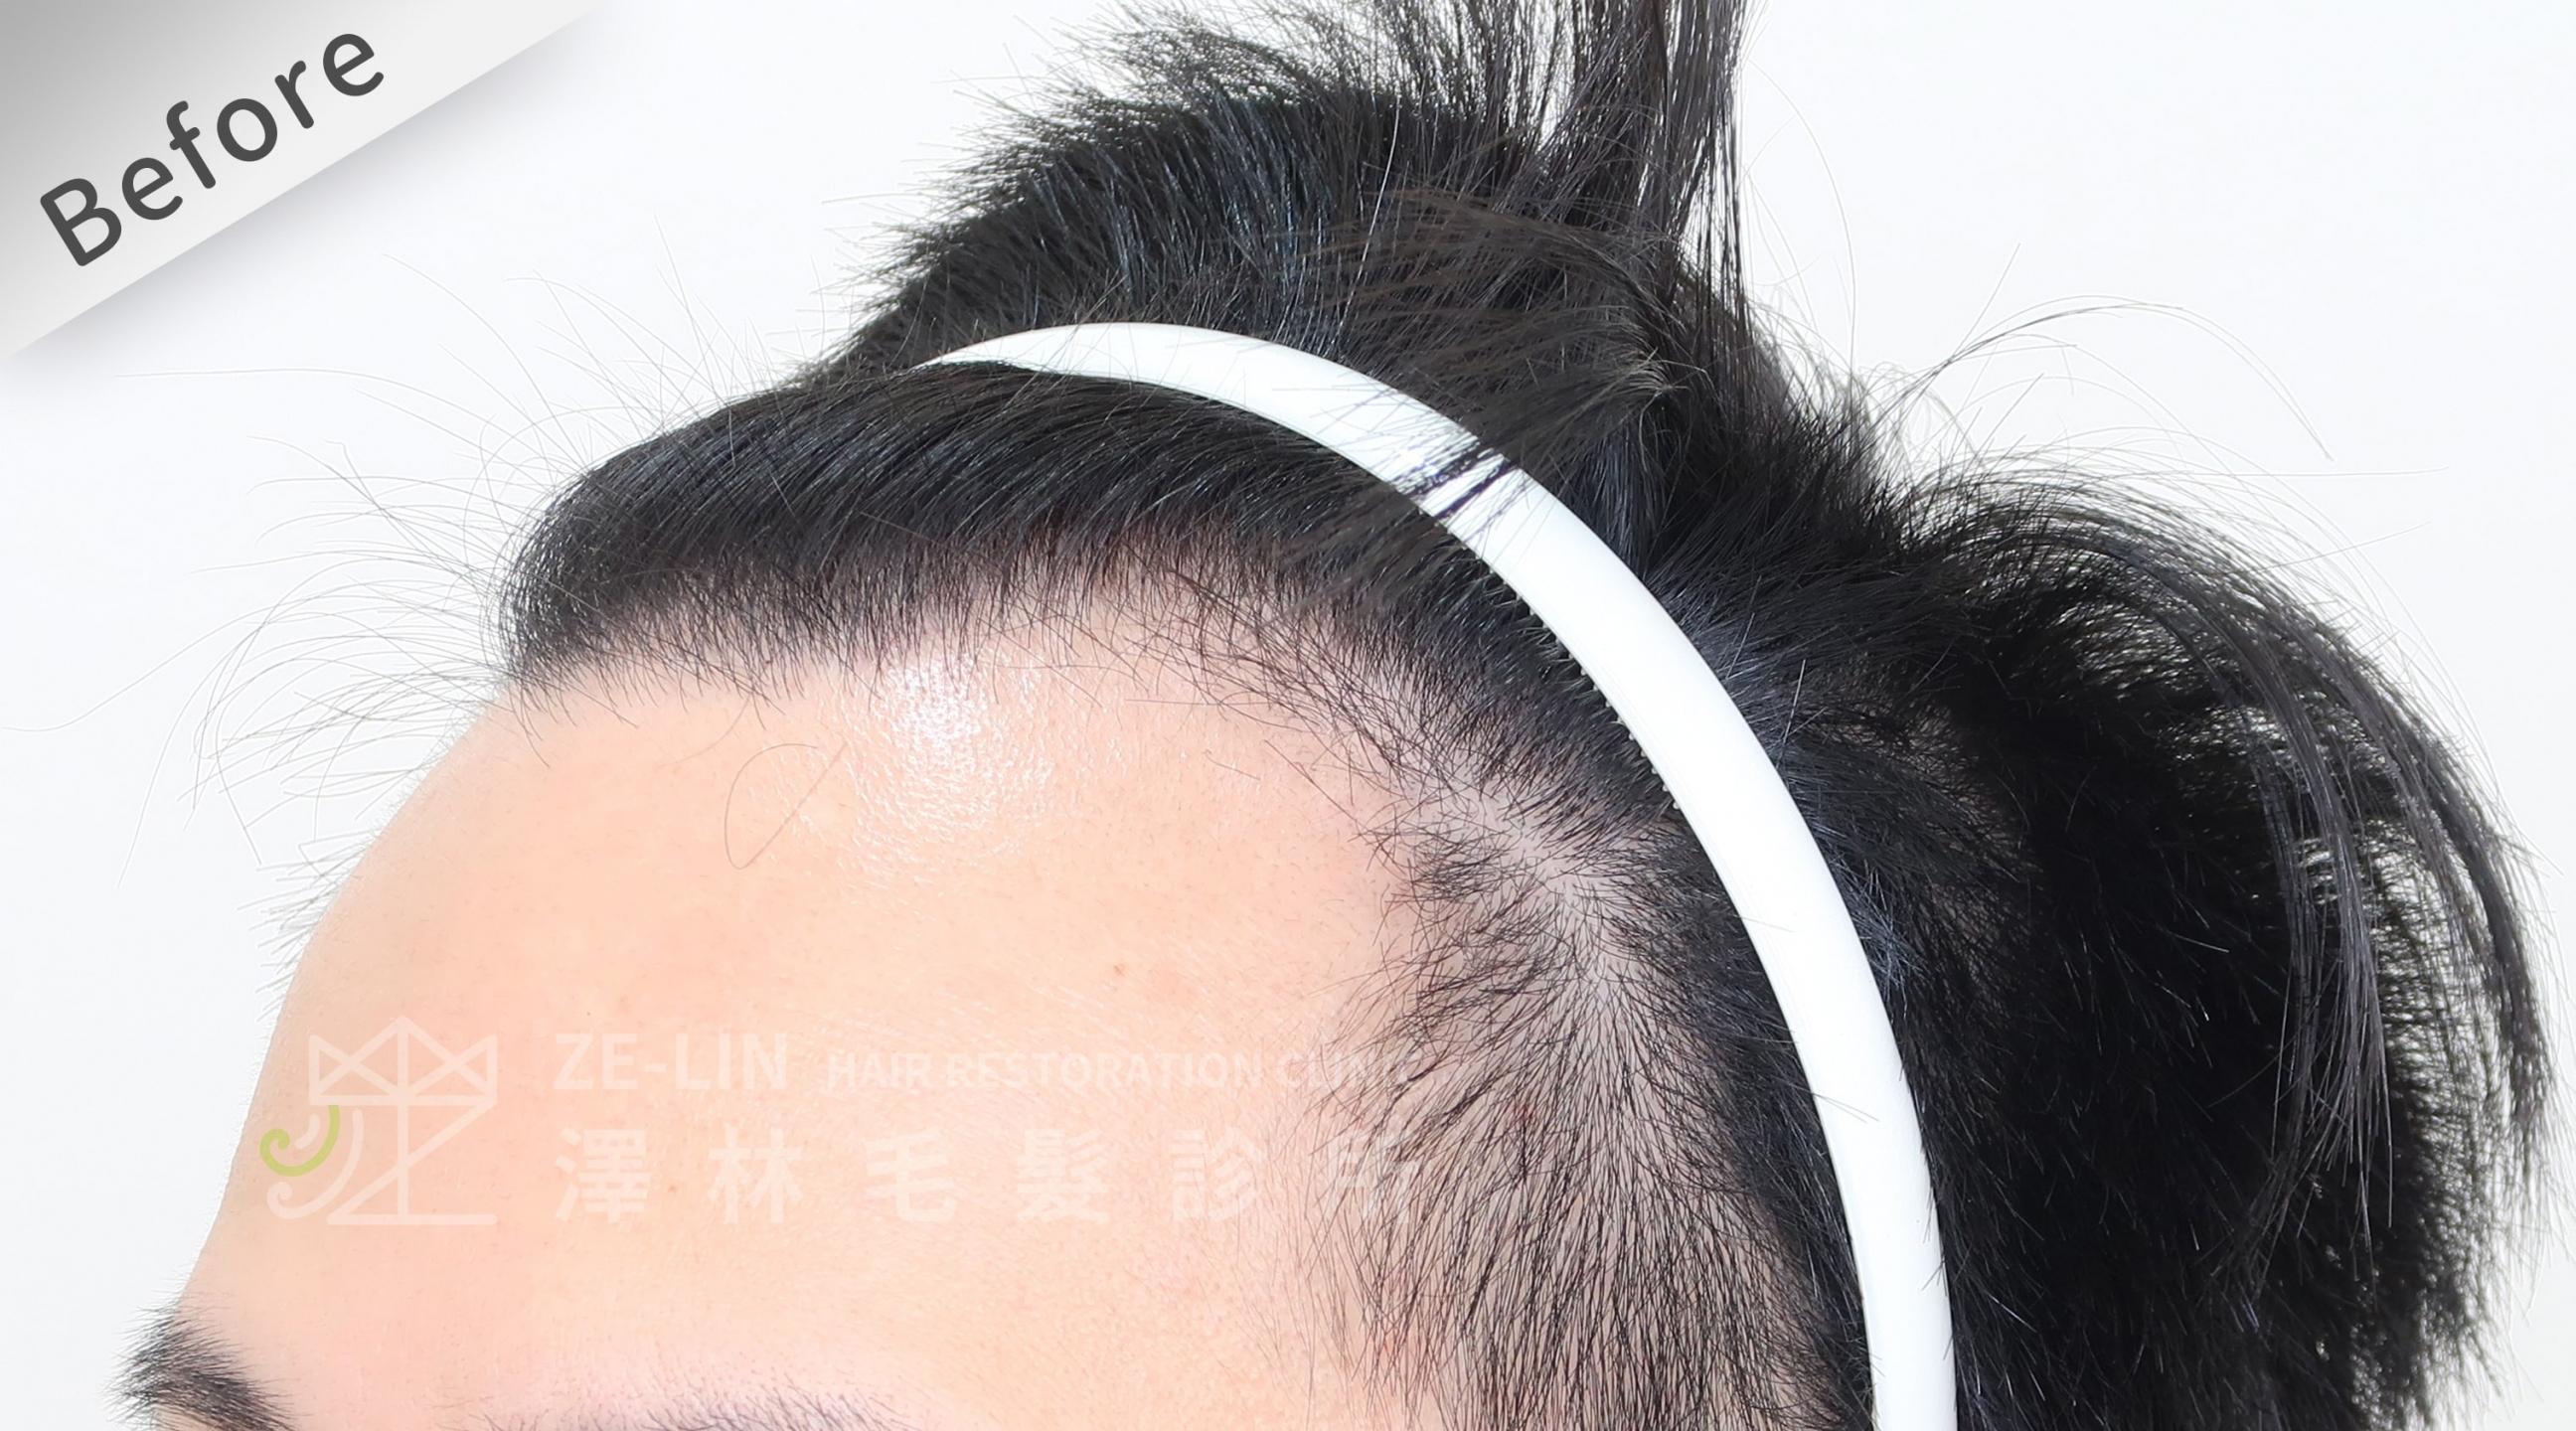 M型雄性髮際線FUE植髮手術-澤林毛髮診所植髮推薦-案例心得分享術前